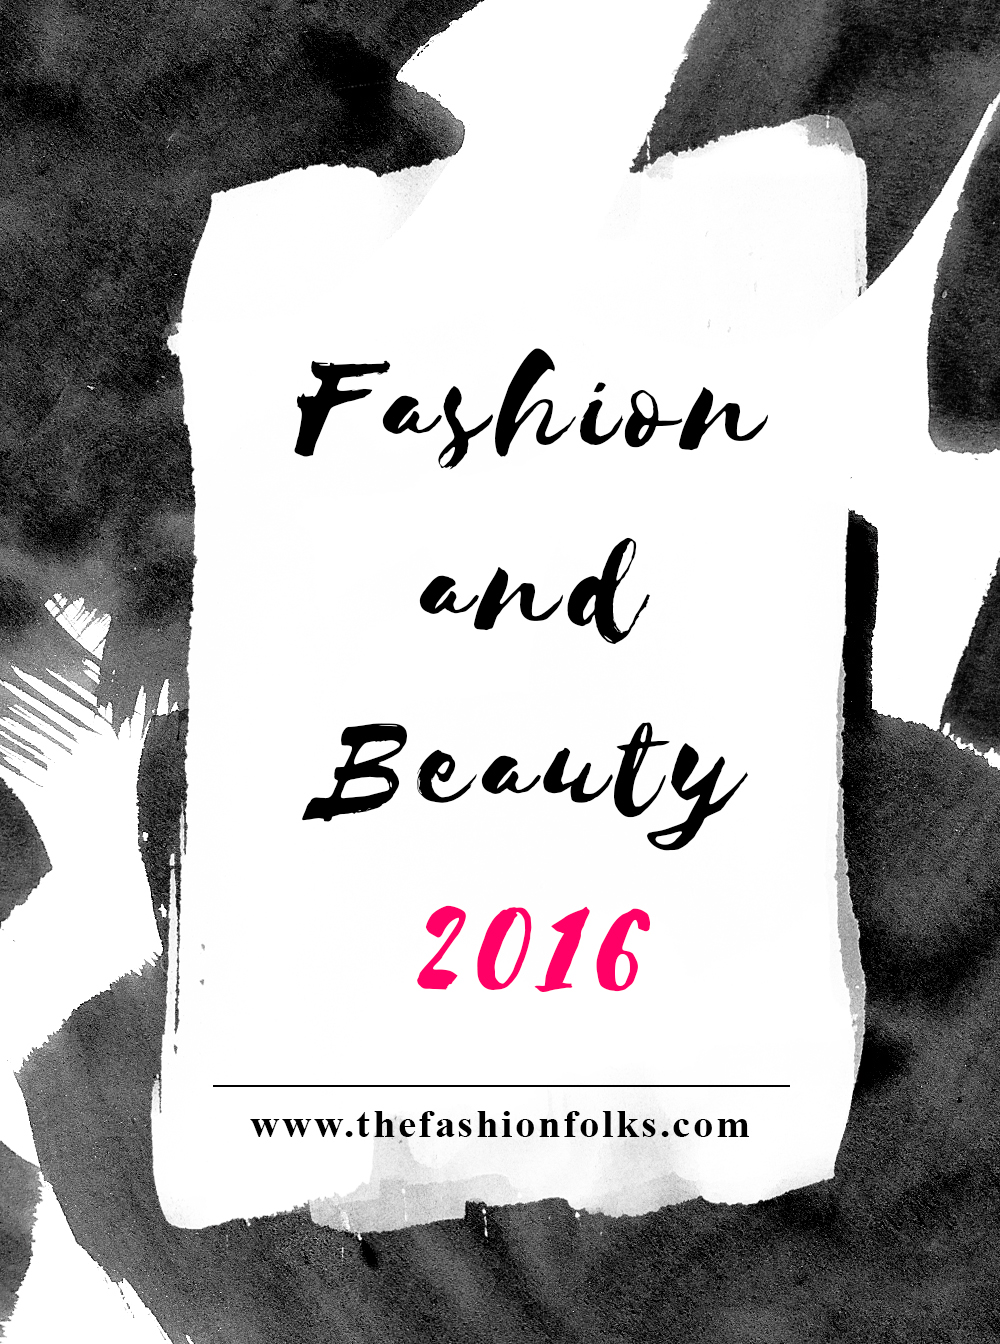 Fashion and beauty trends 2016 + fashion inspiration   The Fashion Folks